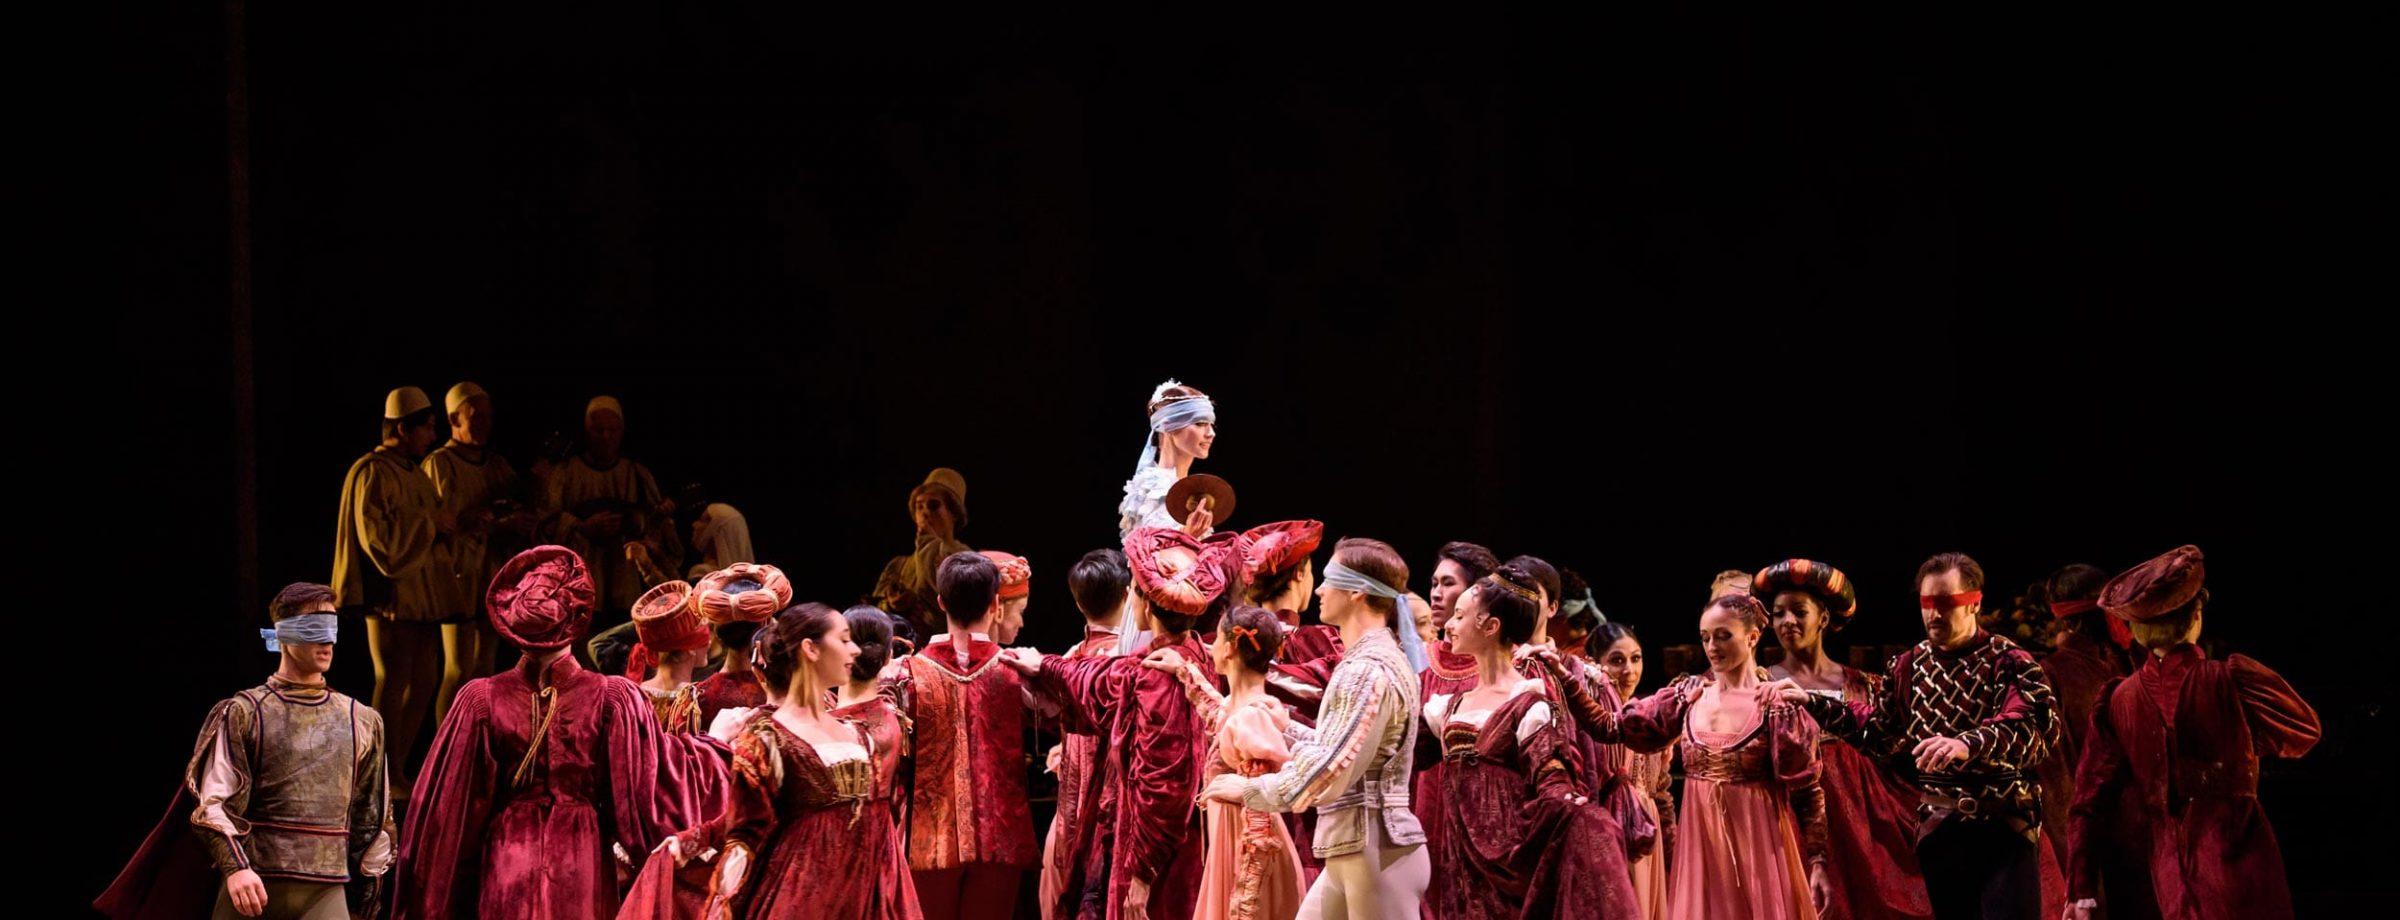 English-National-Ballet-dancers-in-Romeo-&-Juliet-©Bill-Cooper-(4)